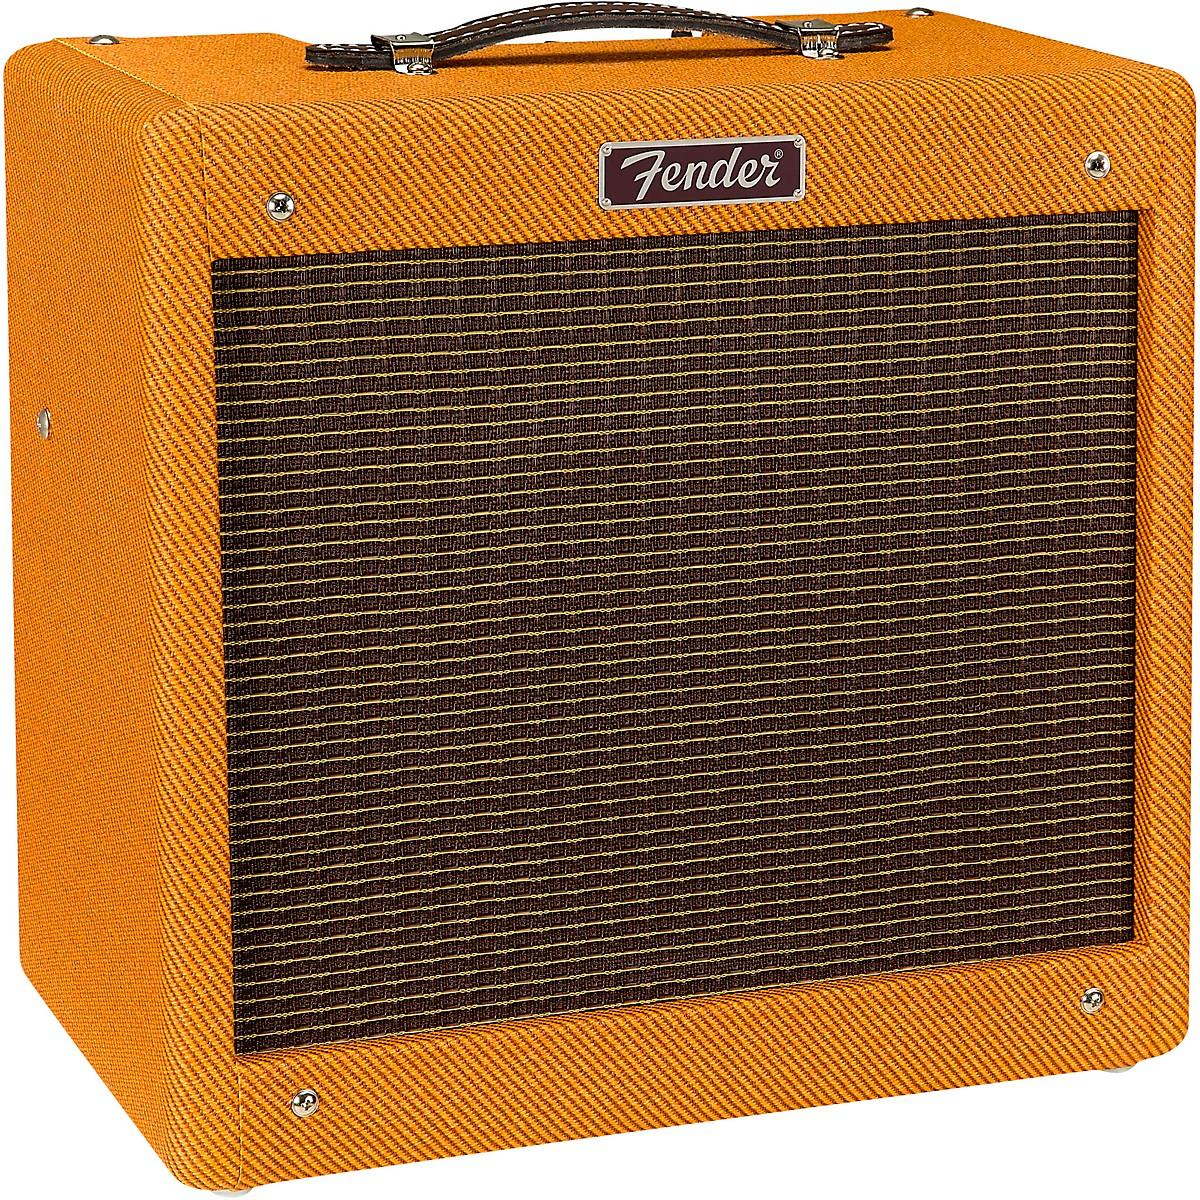 Fender Pro Junior IV 15W 1x10 Tube Guitar Combo Amplifier